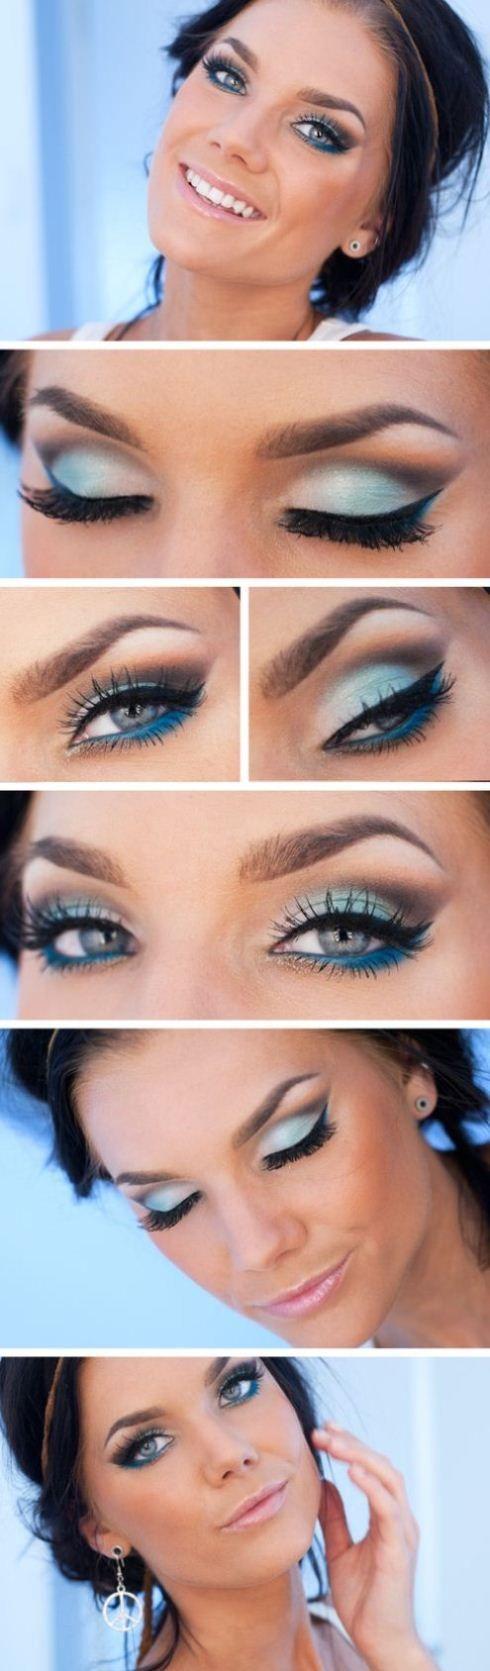 best eyes images on pinterest make up looks eye make up and